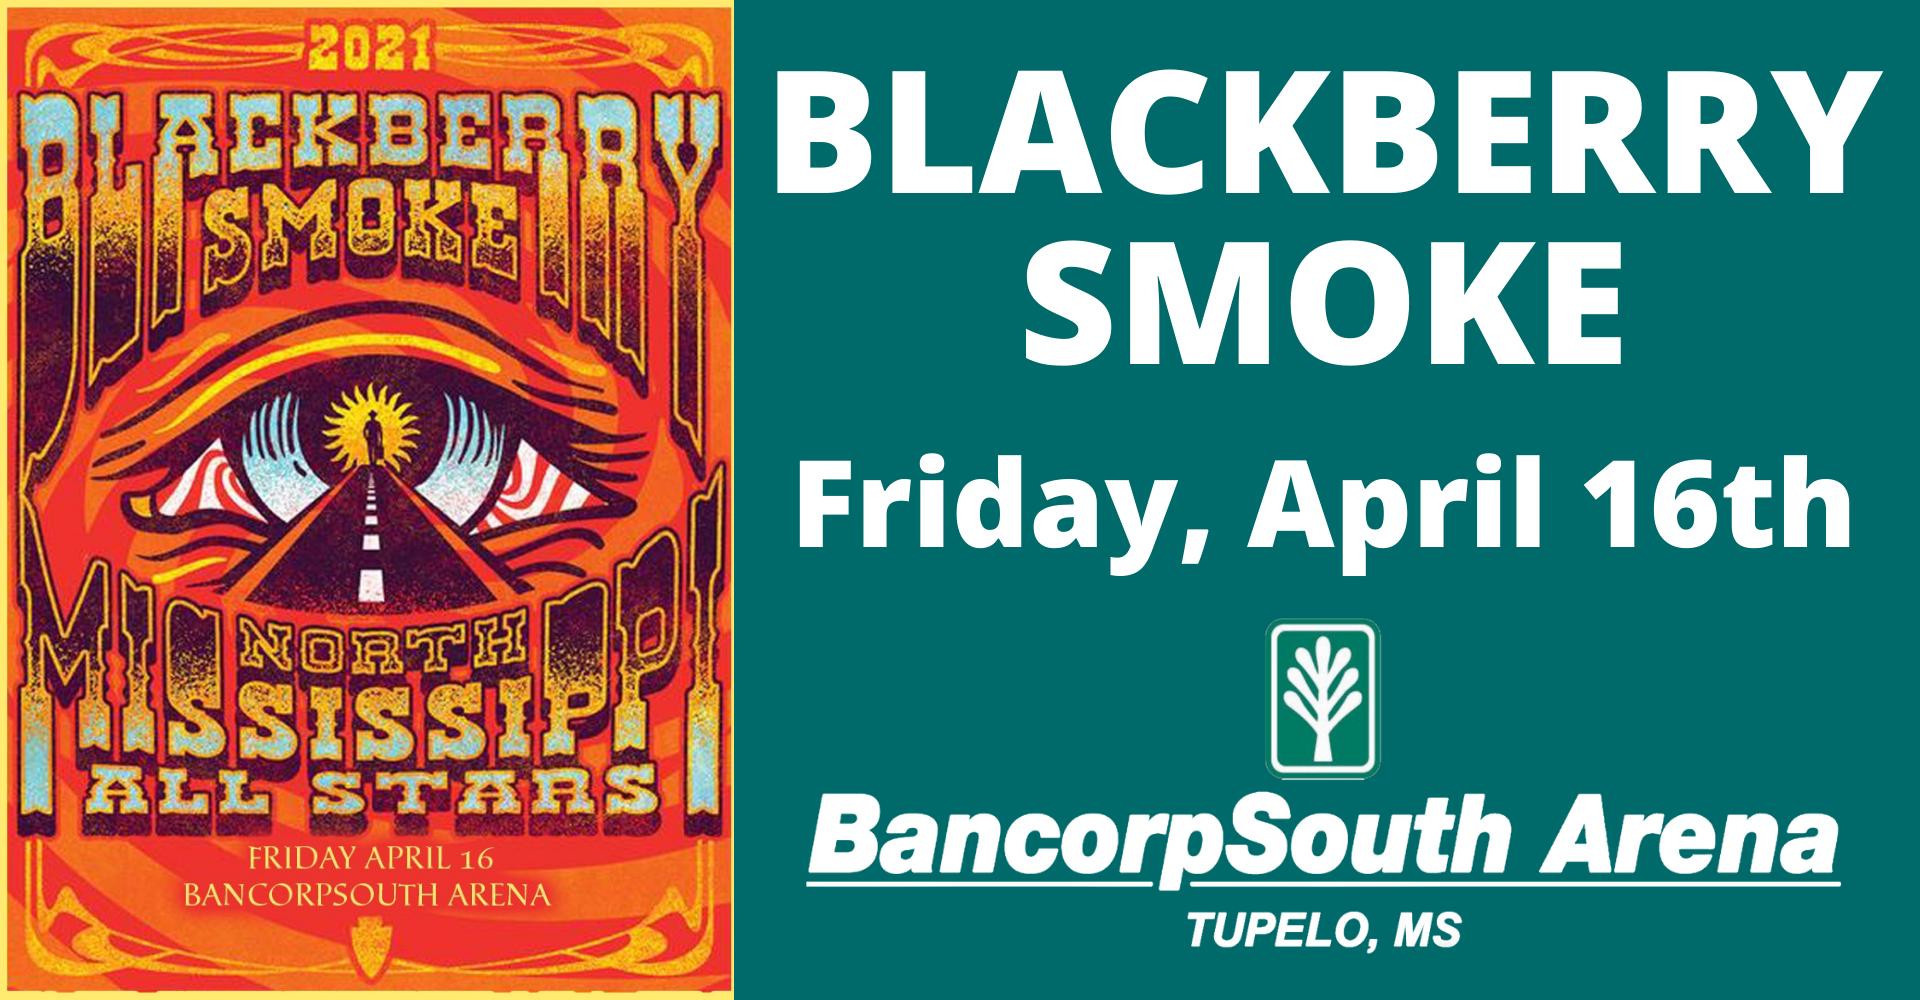 Blackberry Smoke & North Mississippi All Stars